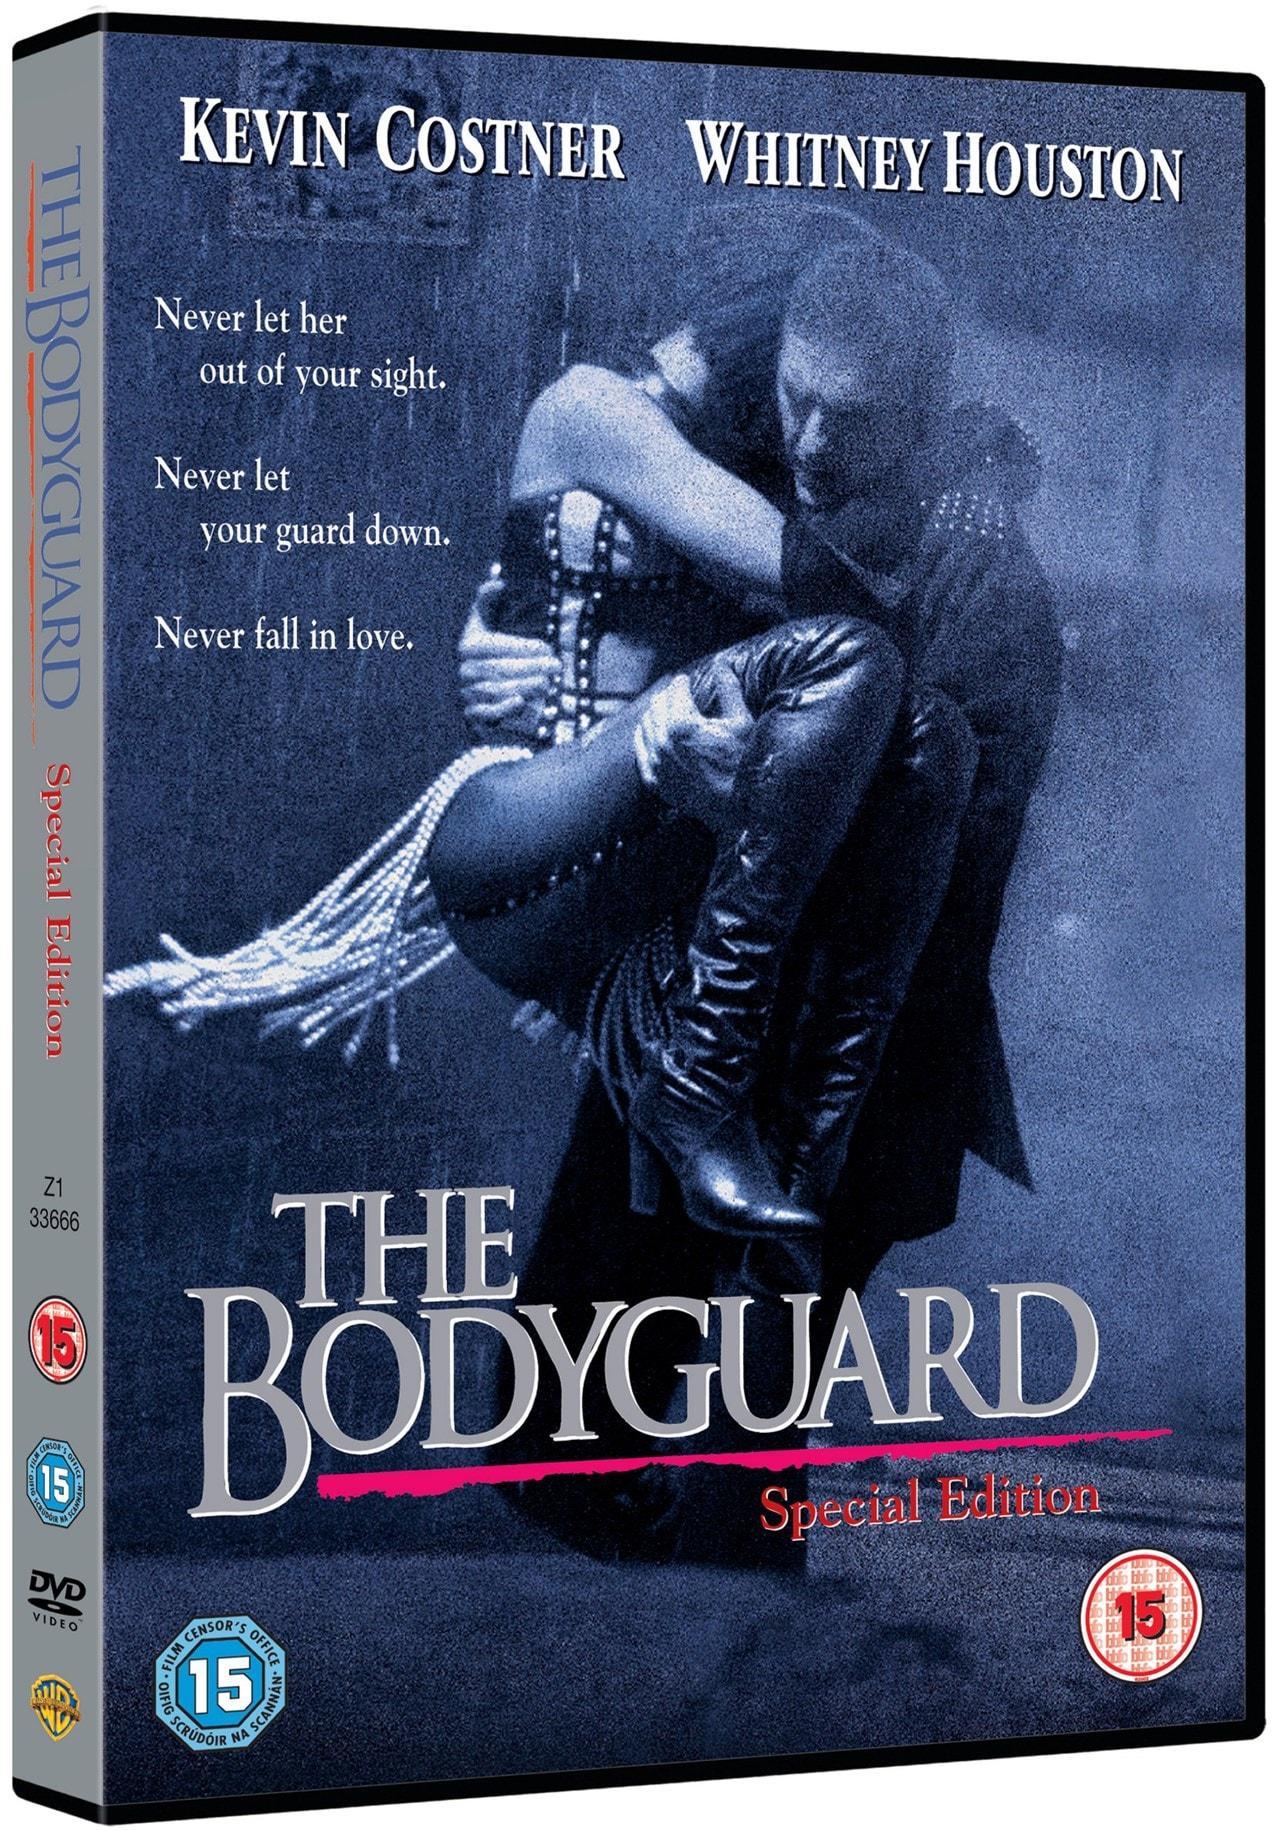 The Bodyguard - 2